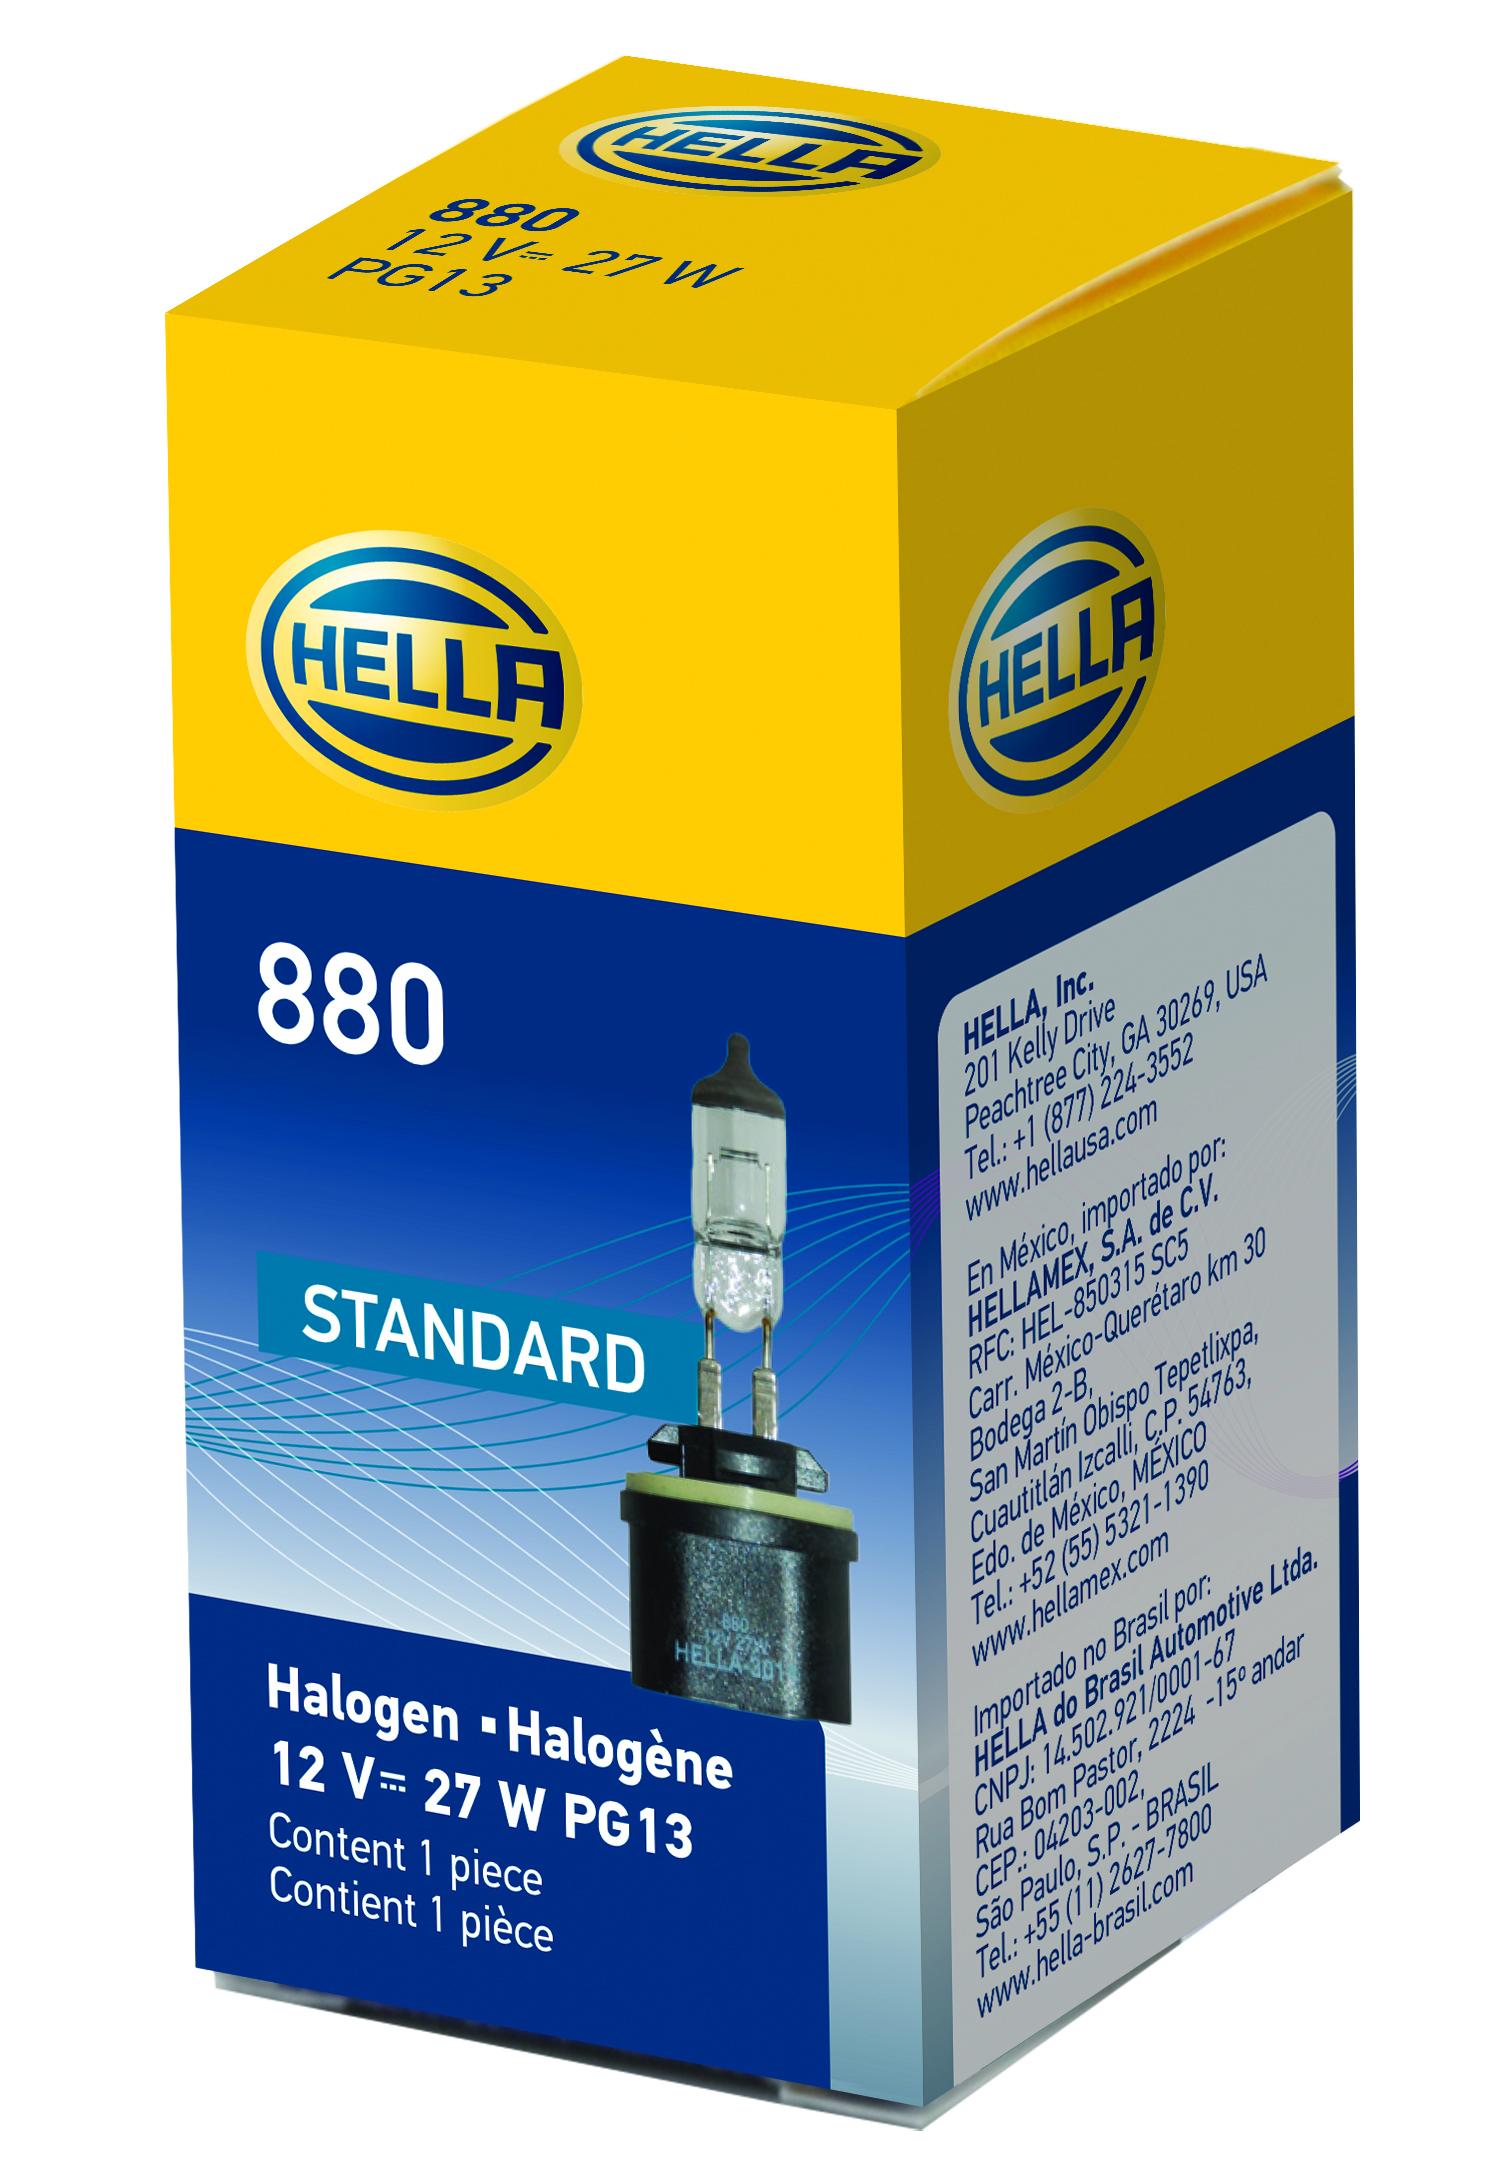 Hella Front Fog Light Bulb 78410 880